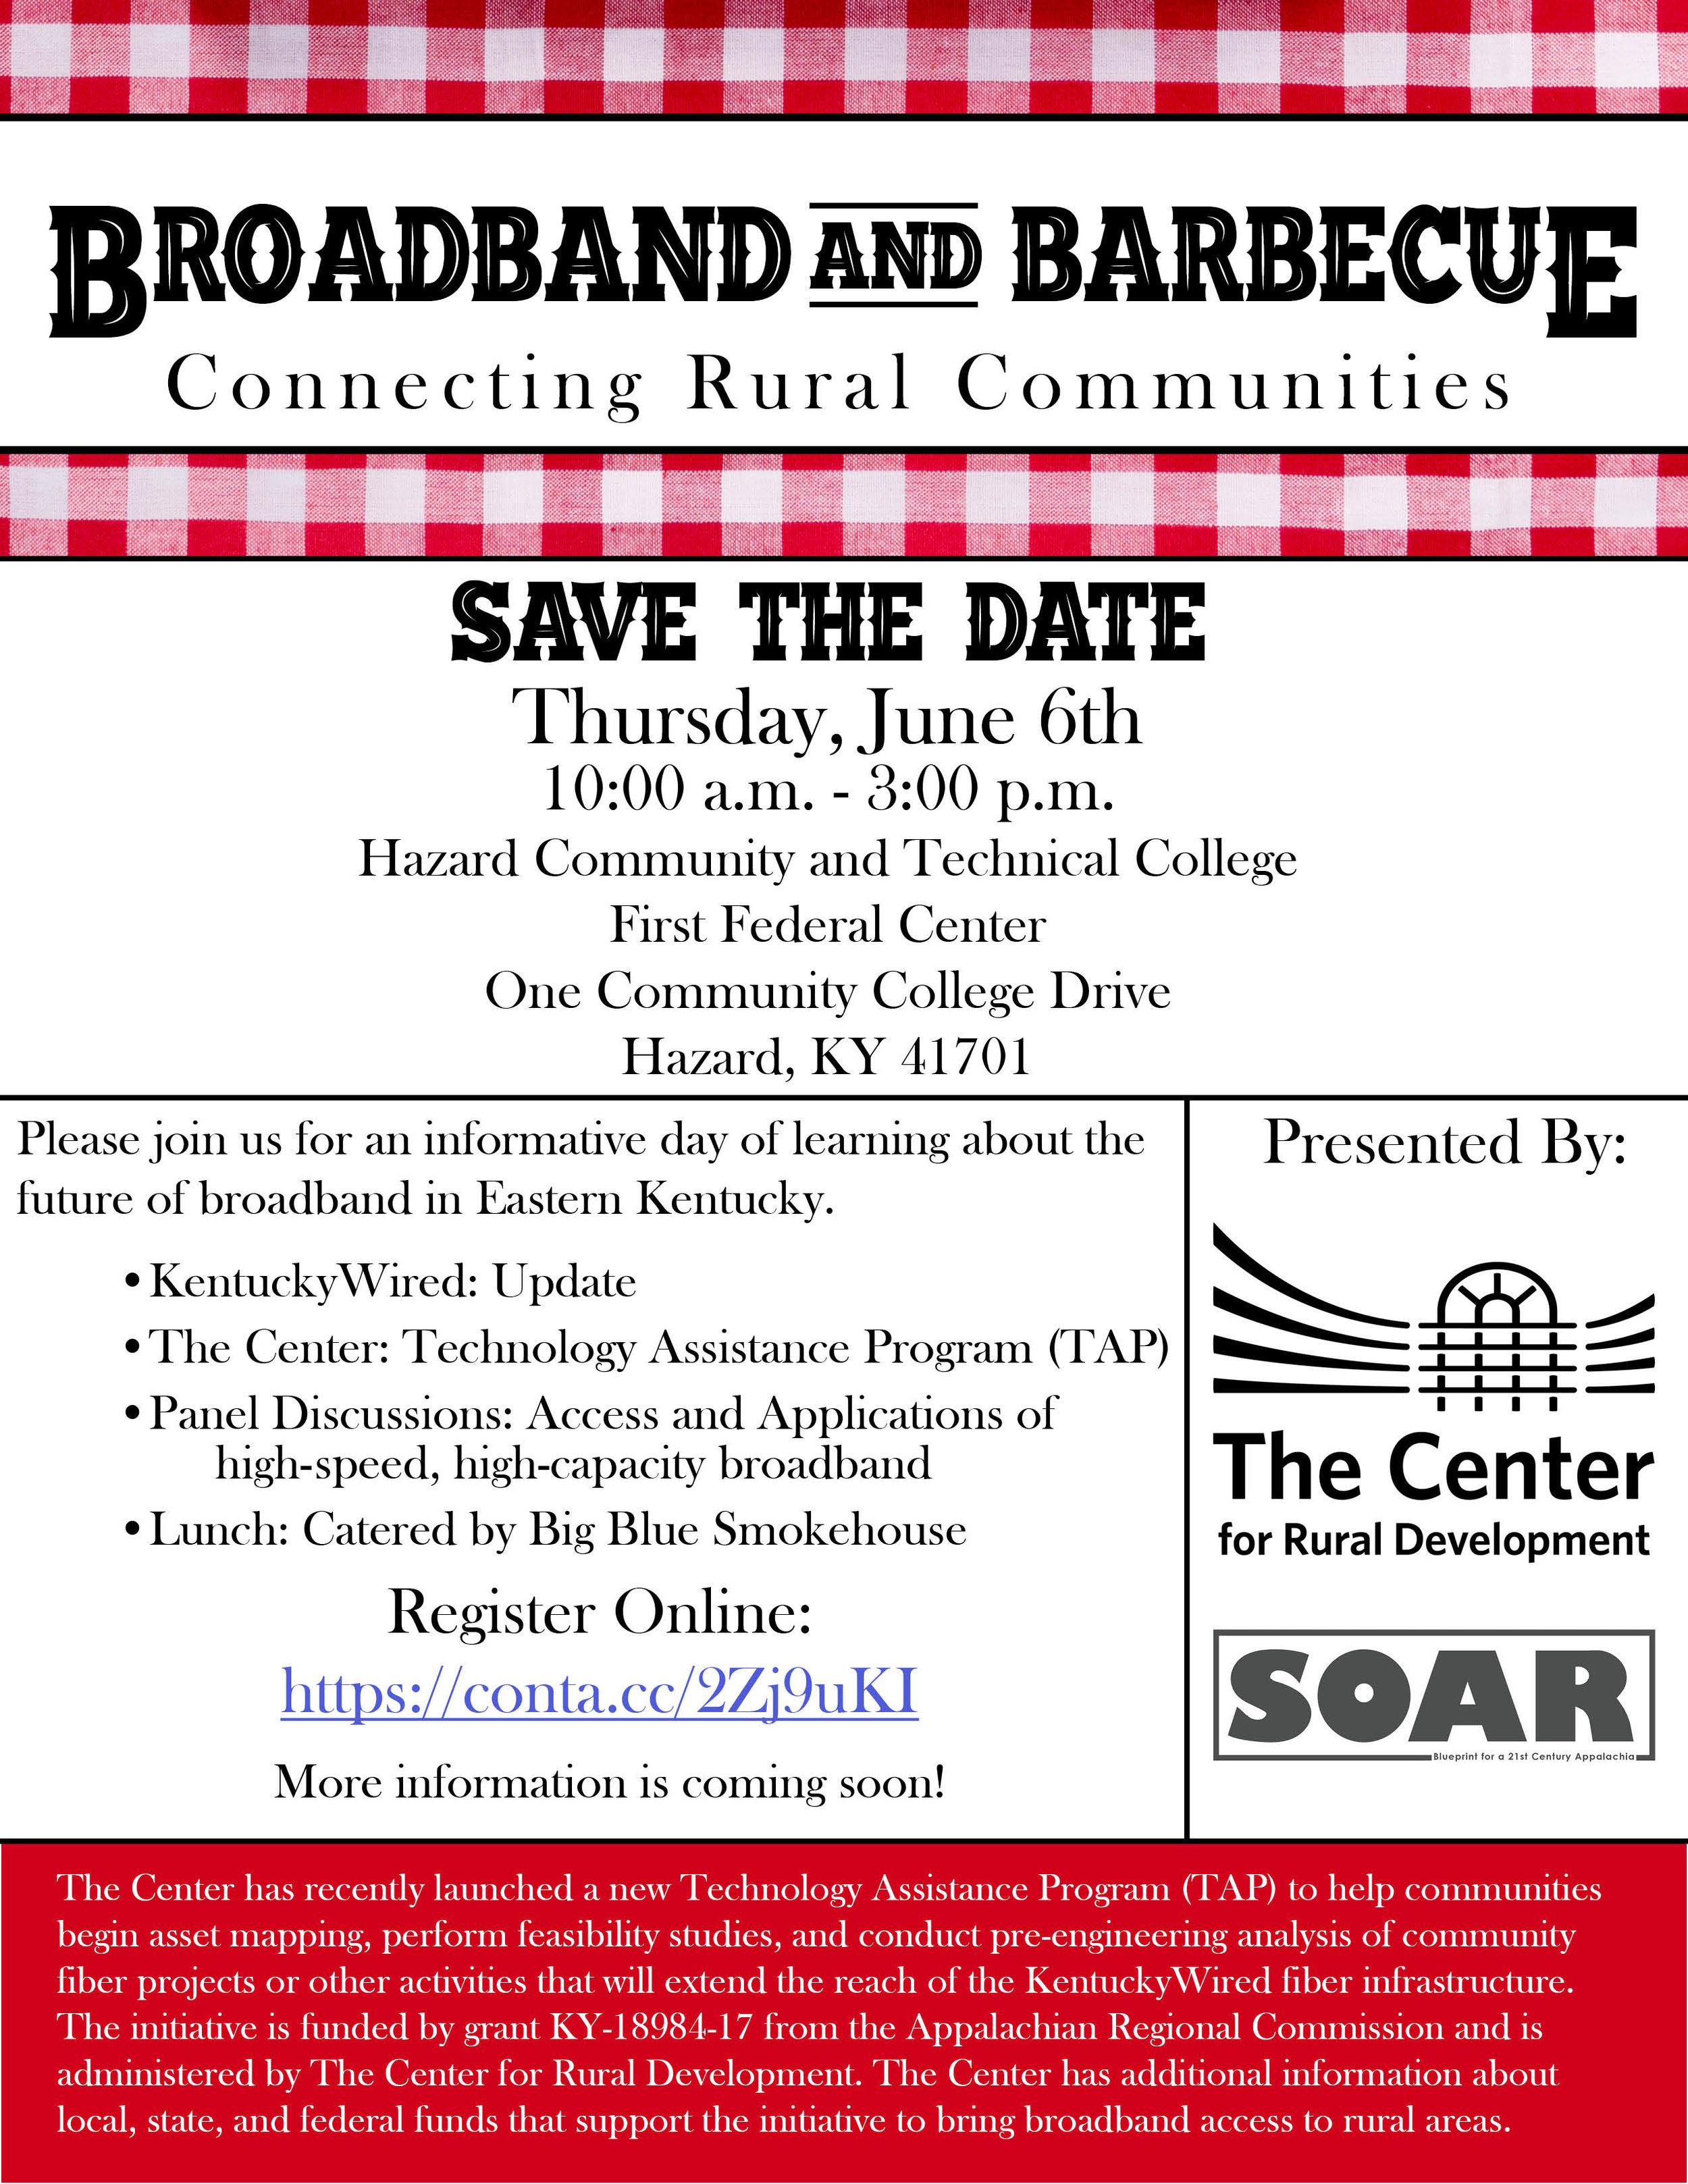 BBandBBQ Save the Date Flyer 4.17.19.jpg